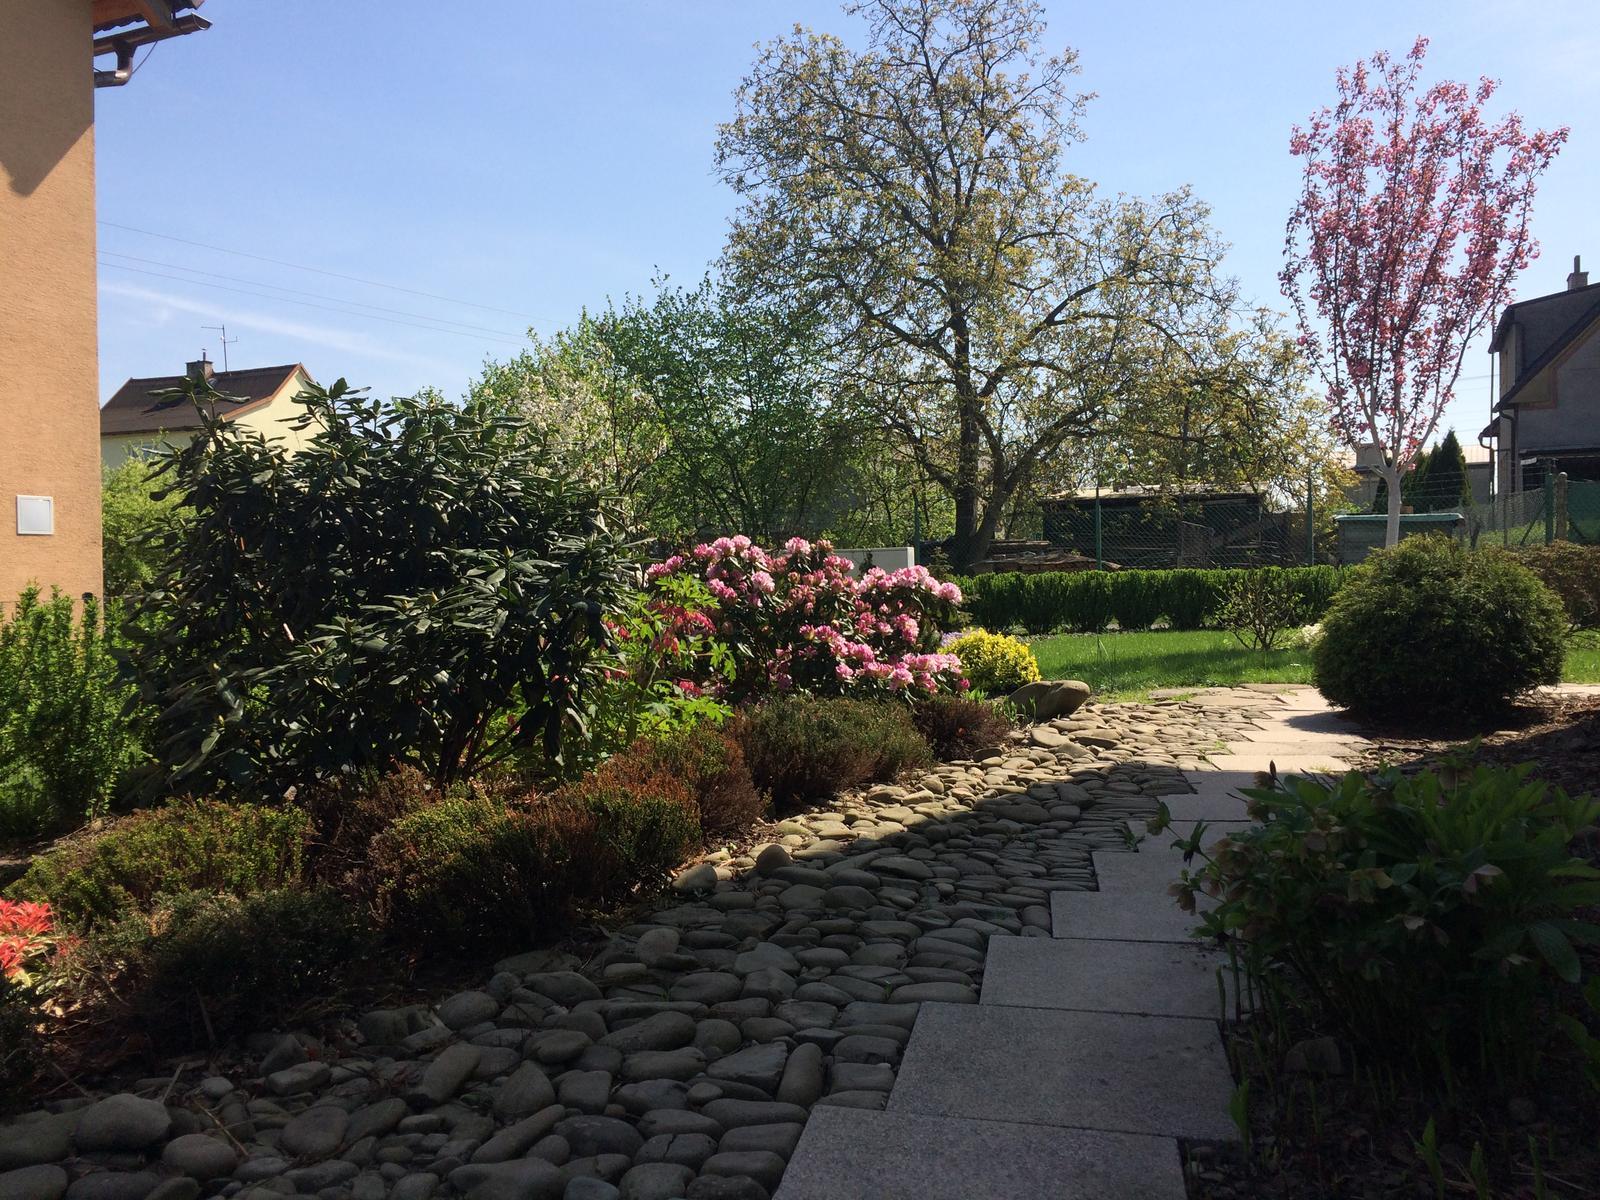 Zahrada 2018 - Obrázek č. 59